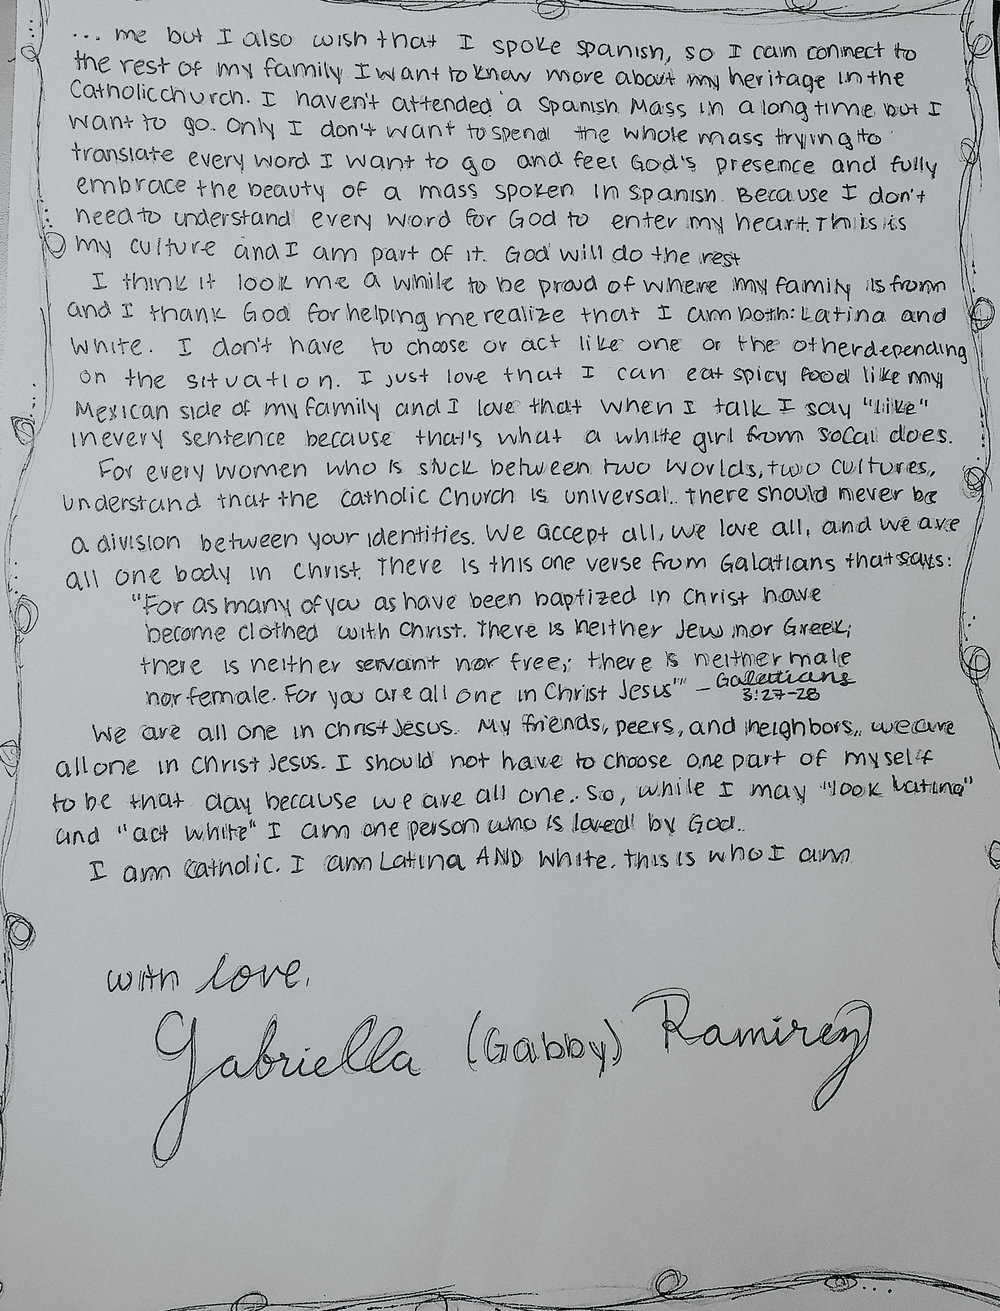 The Catholic Woman Letter 2.jpg